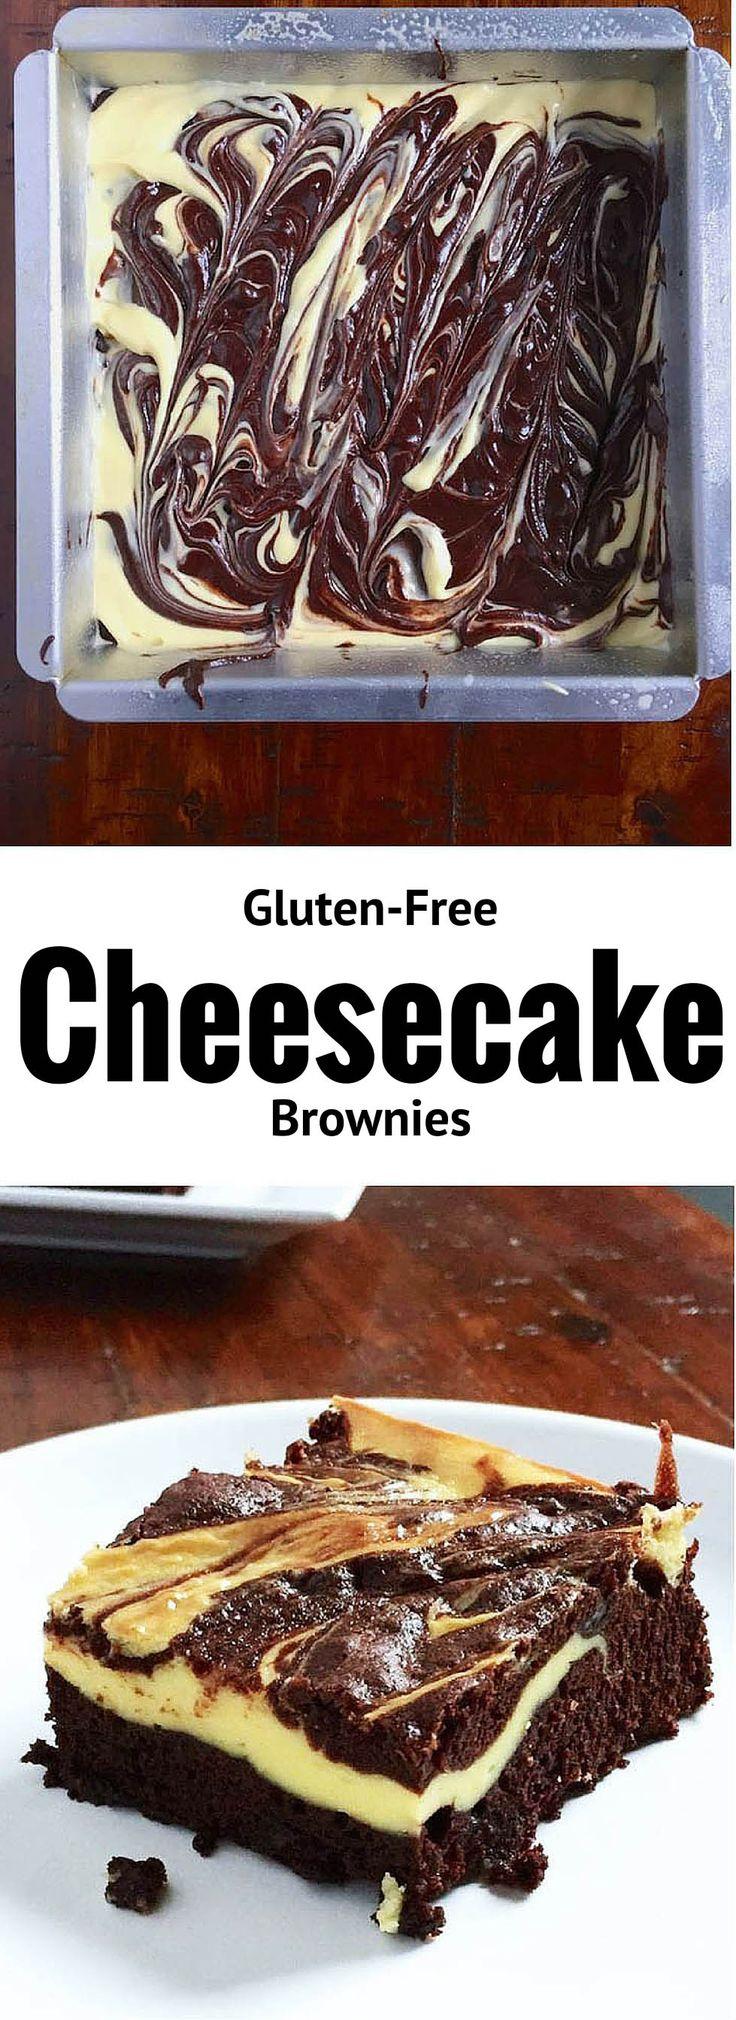 Gluten-Free Cheesecake Brownies